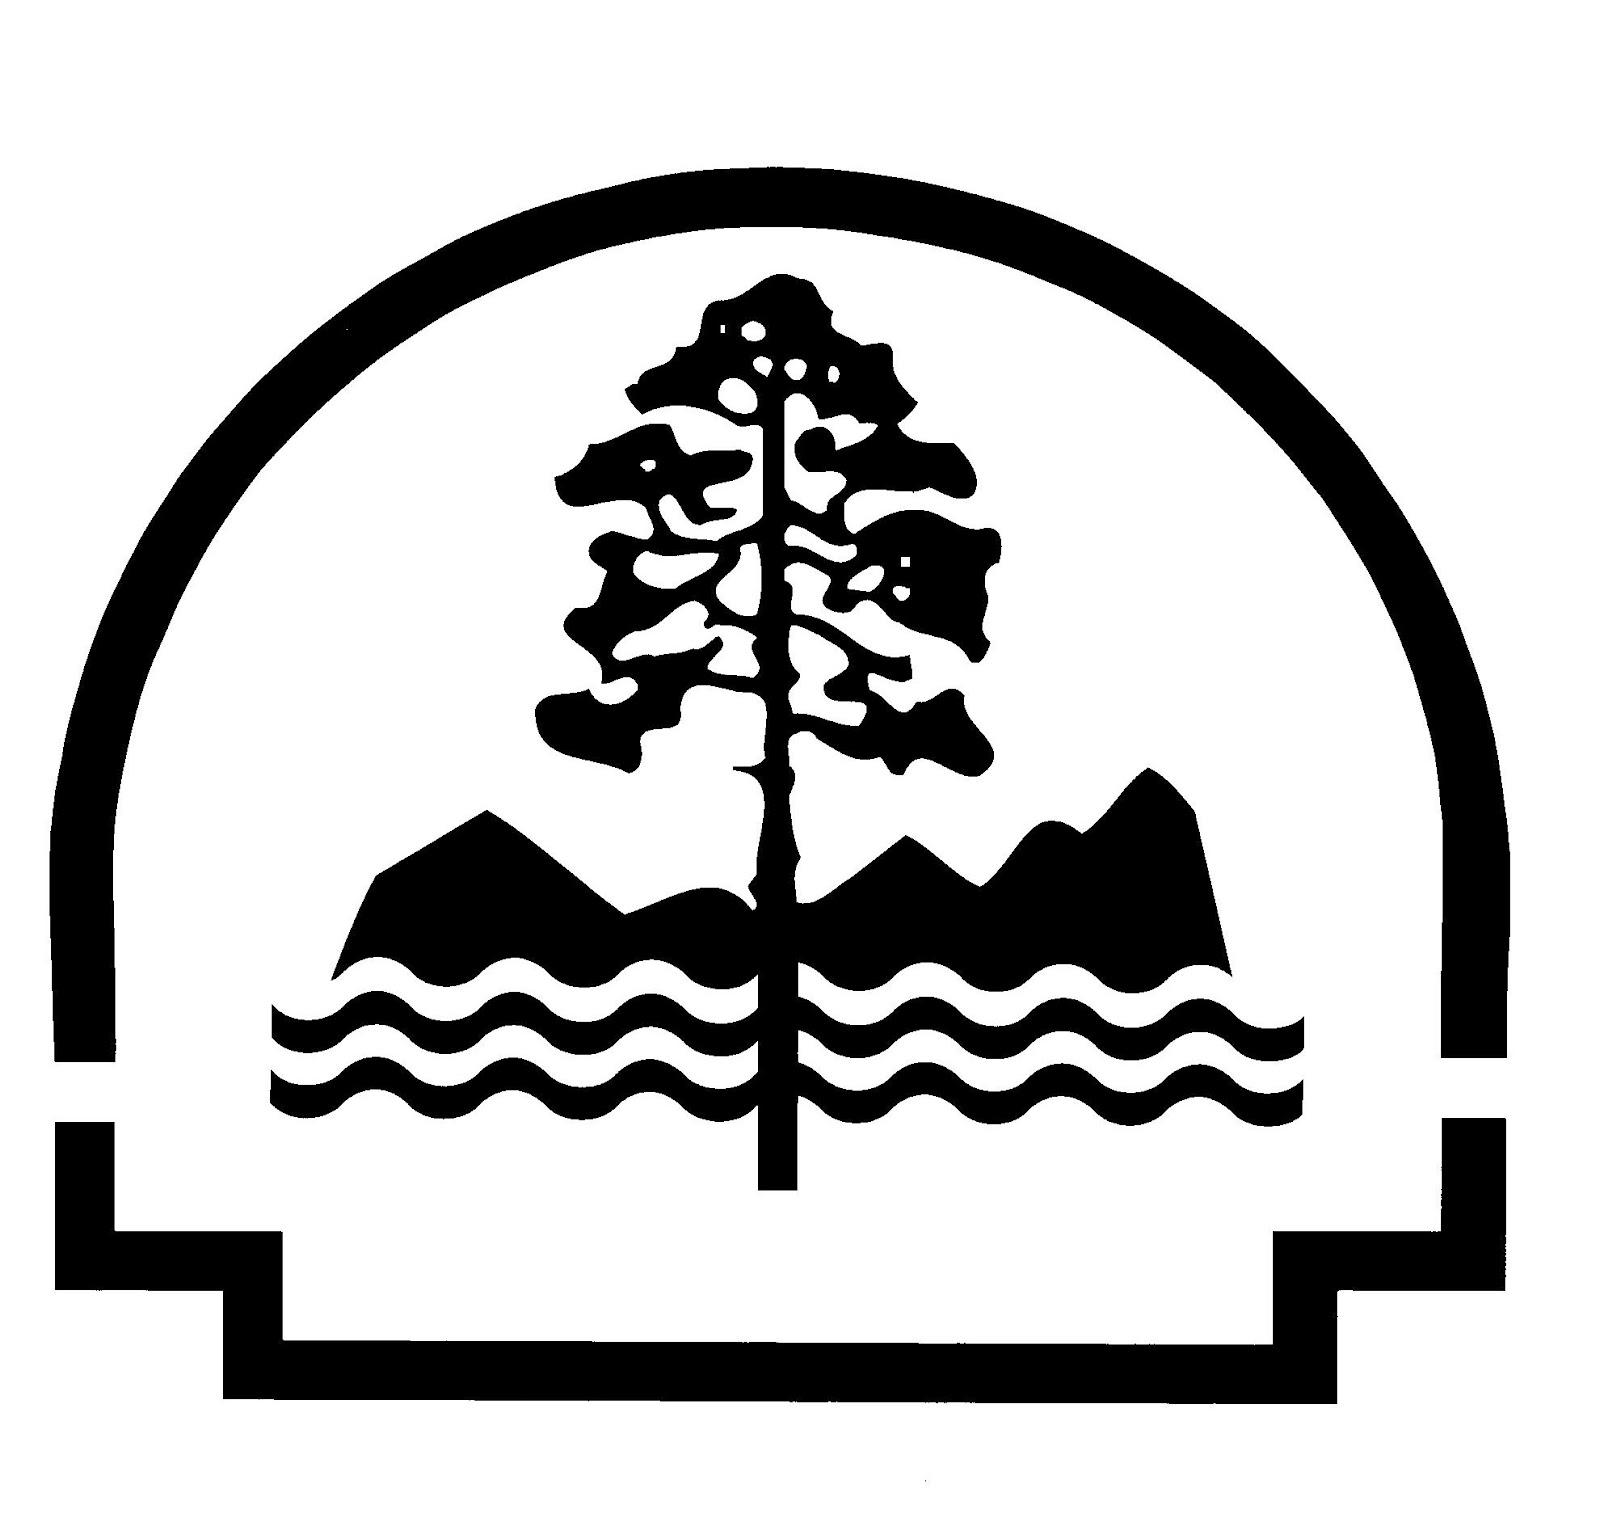 Blog de Técnicas de Progresión Vertical en Espeleología